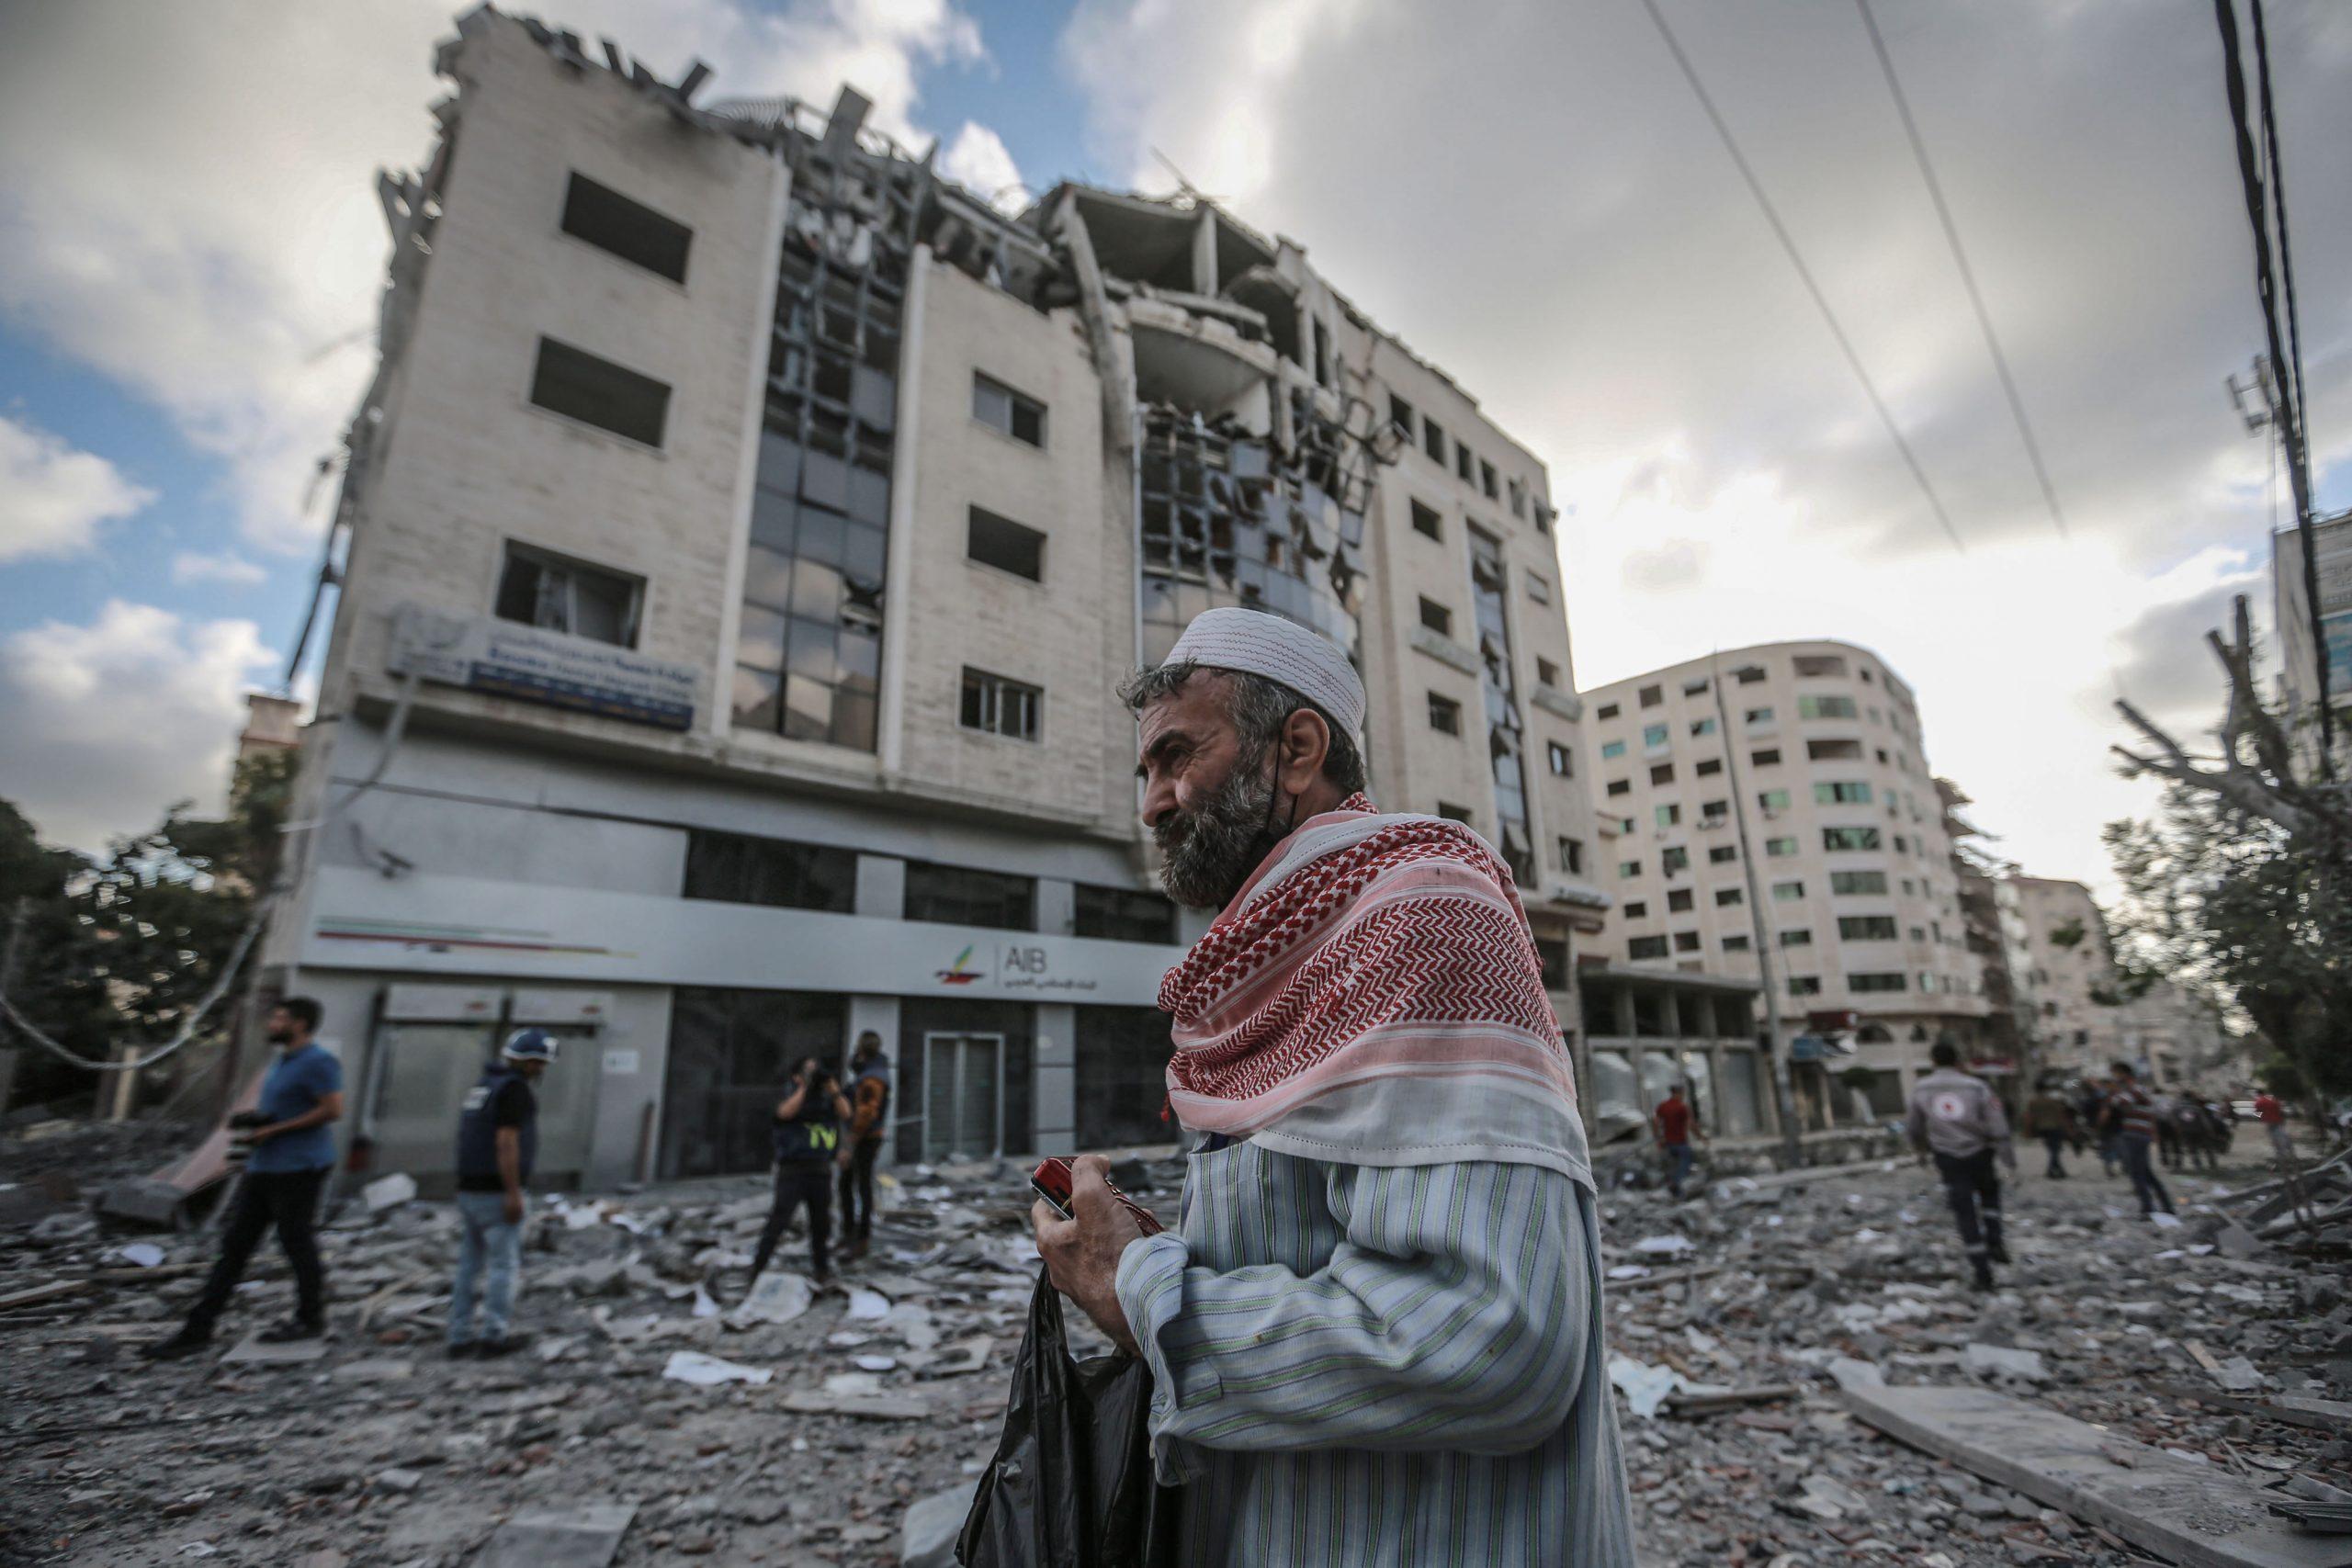 Atac d'Israel a Palestina | Mohammed Talatene/dpa (Europa Press)